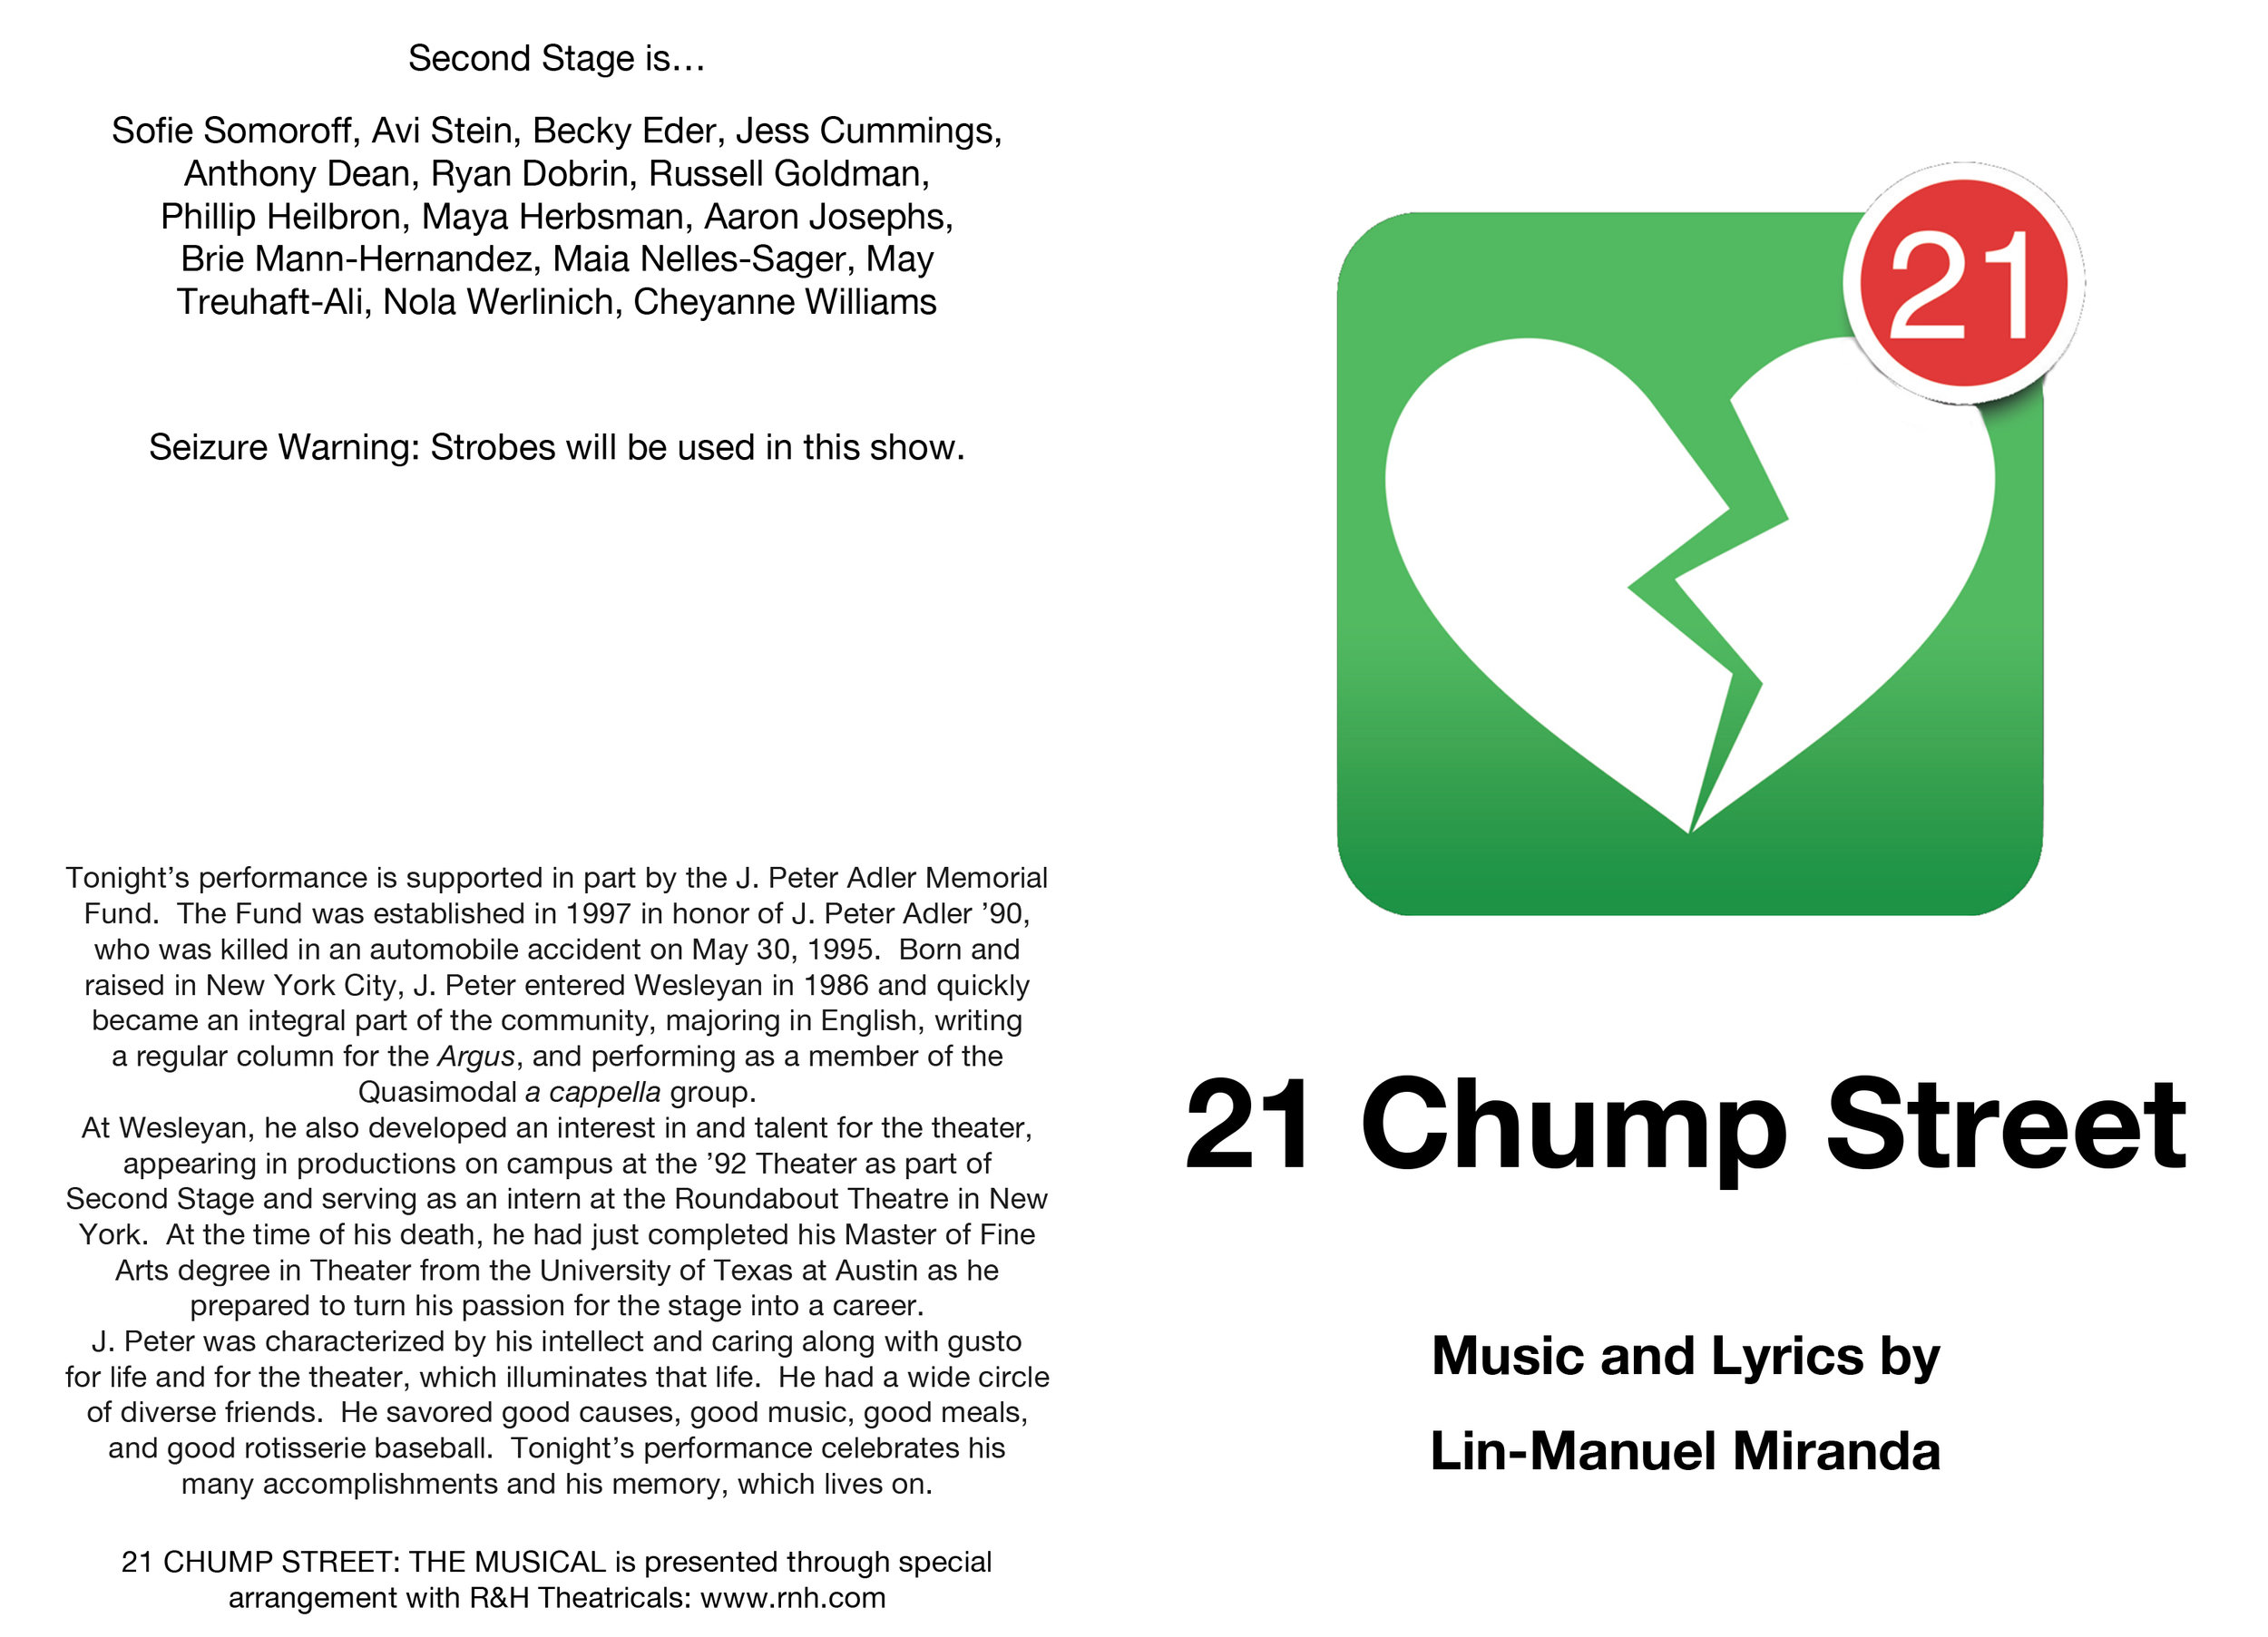 21ChumpSt-Program-1.jpg